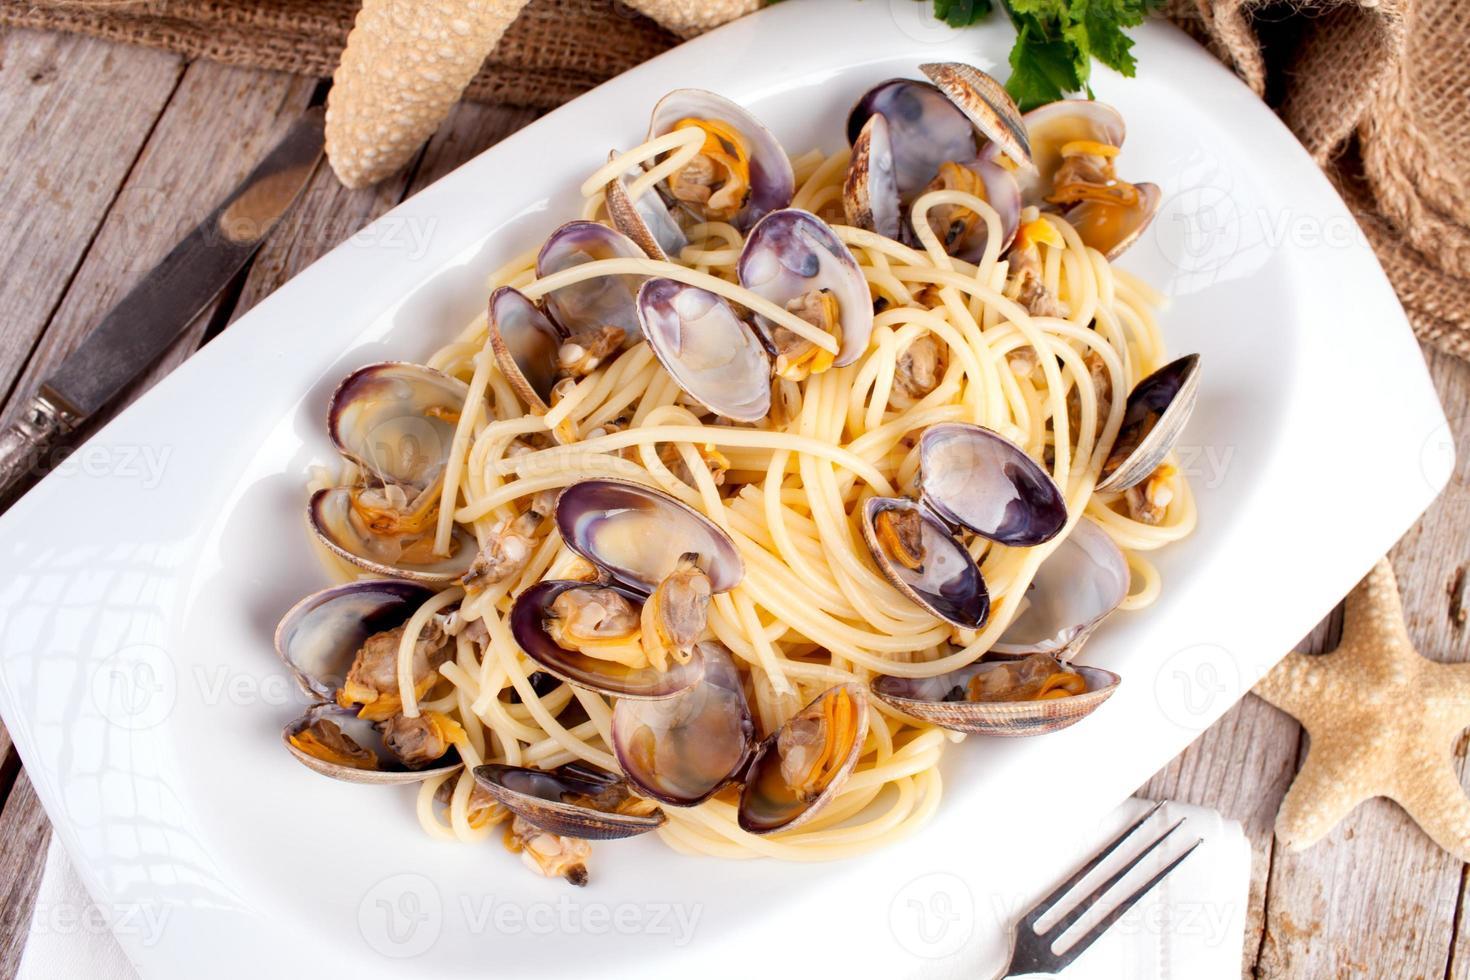 Spaghetti With Clams Recipe photo